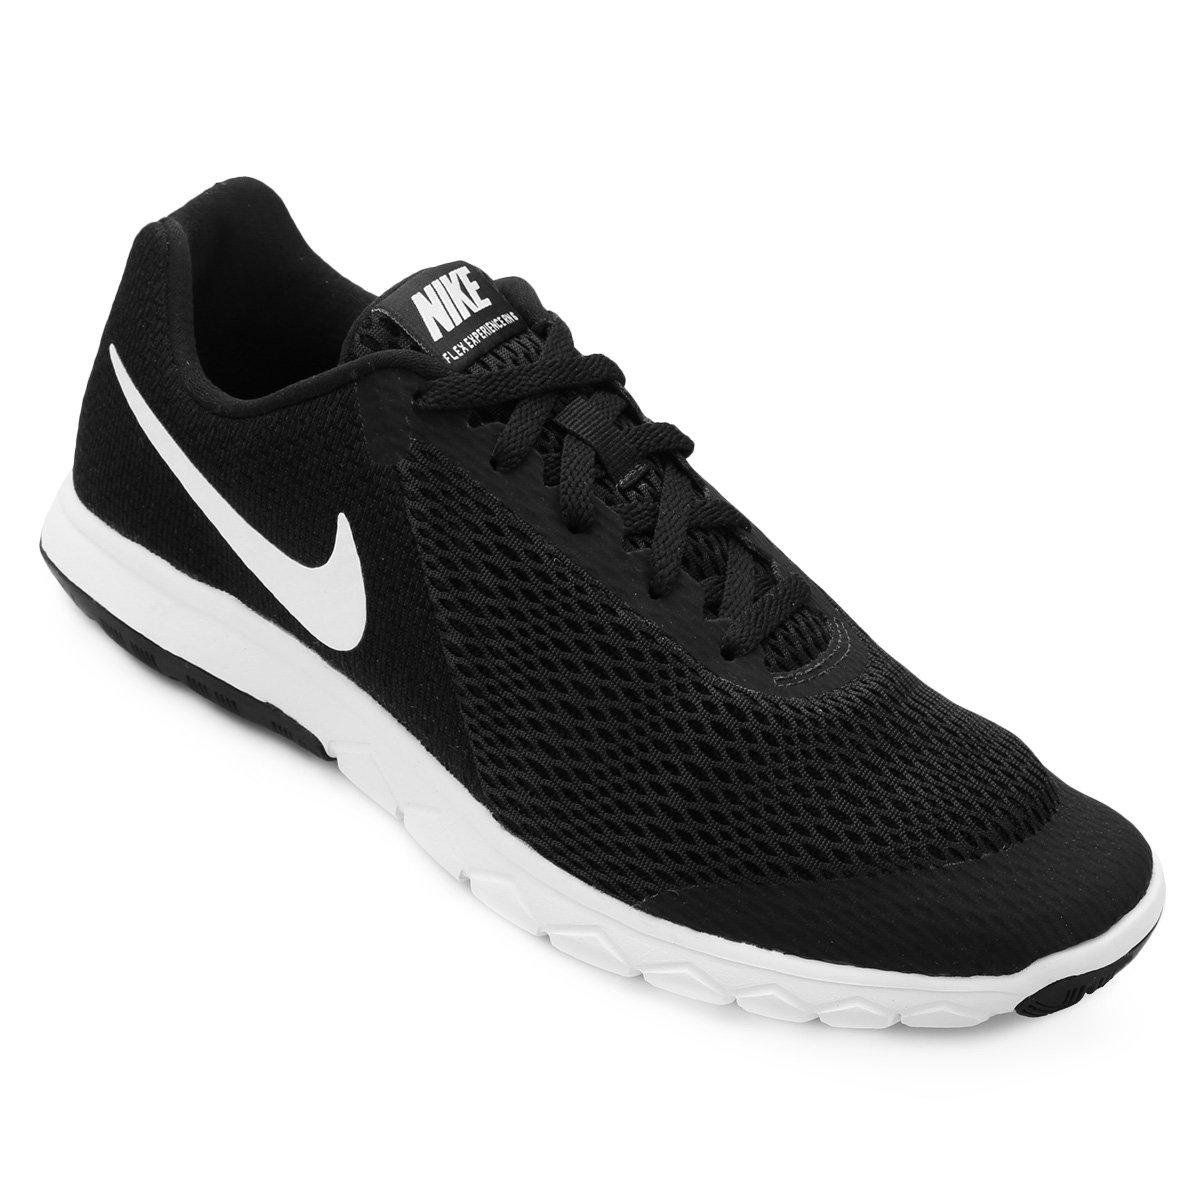 Tênis Nike Flex Experience Rn 6 Feminino - Preto e Branco - Compre ... 32555cddb07c6